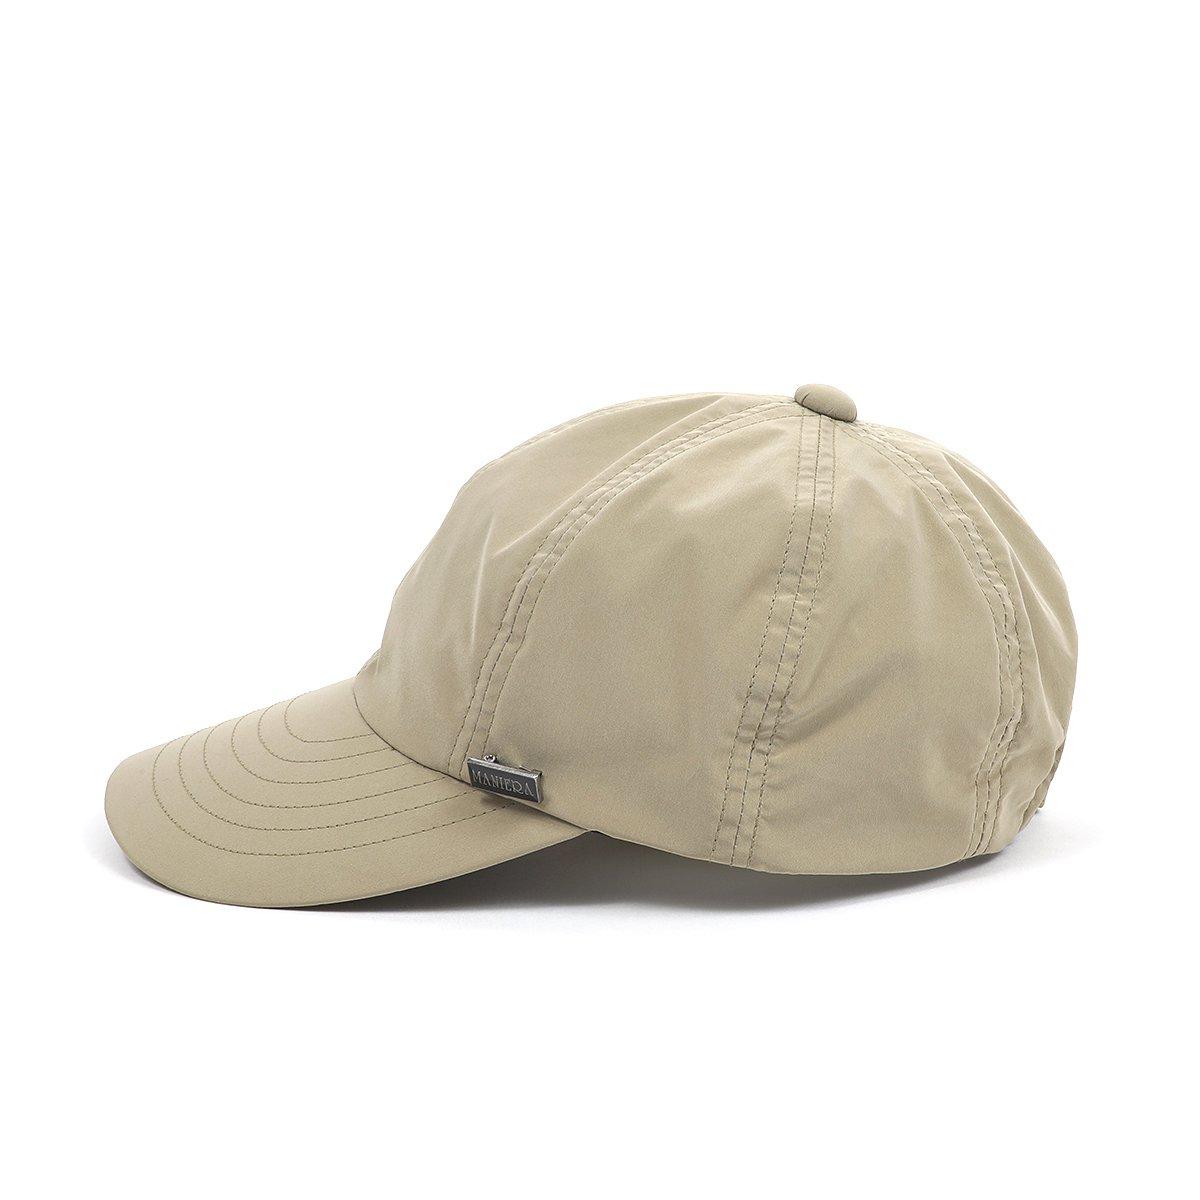 Et-baas CAP 詳細画像3